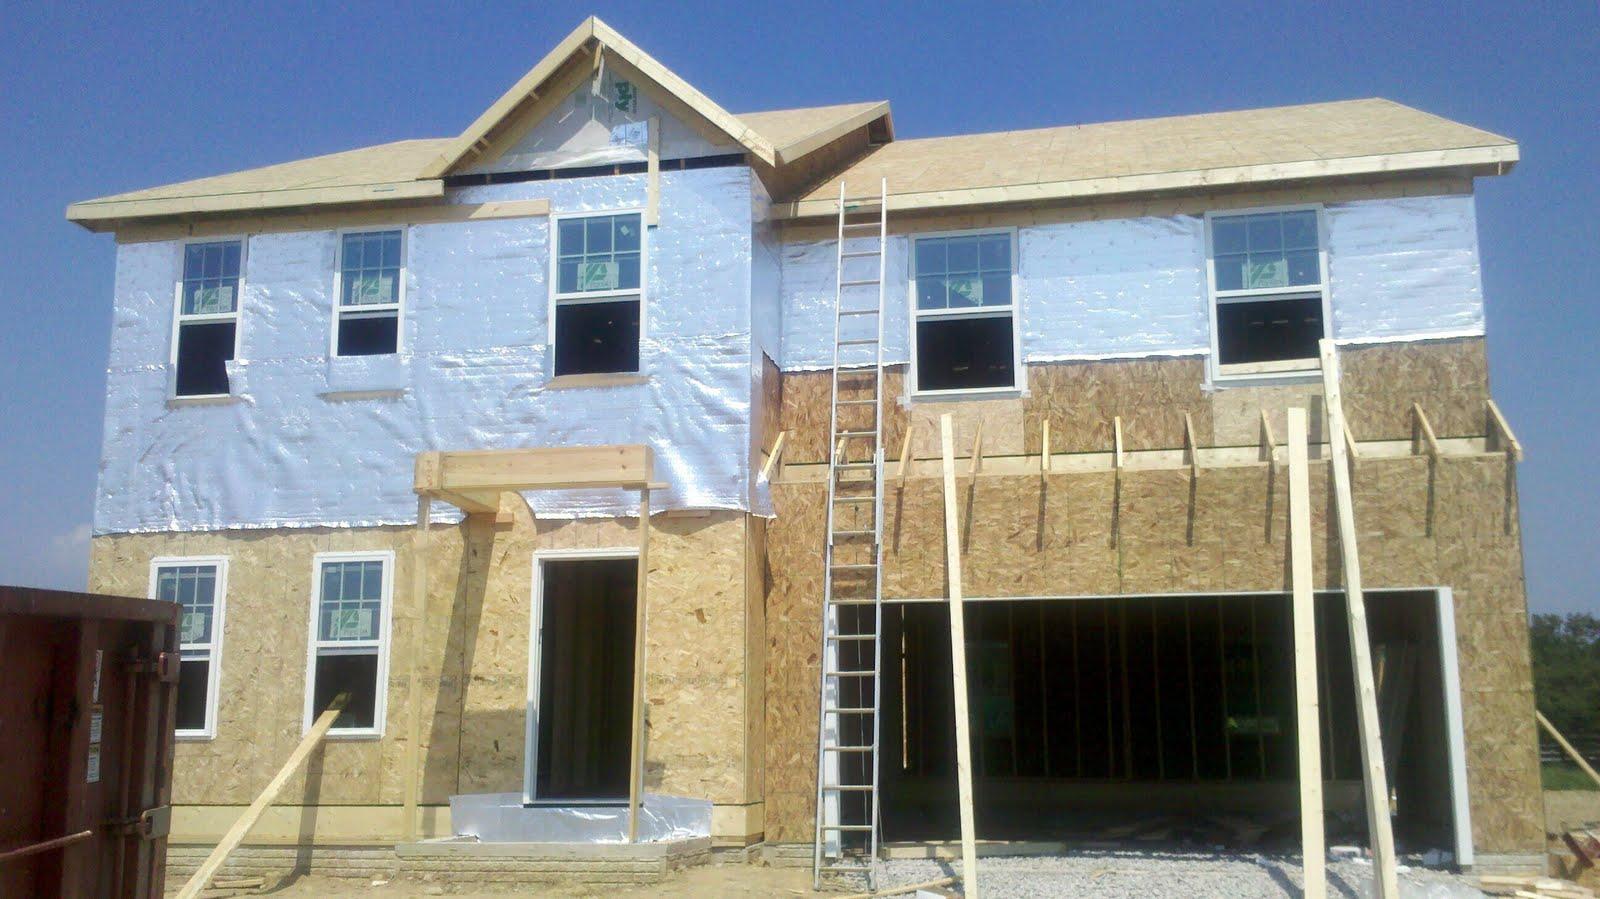 Ryan Homes Floor Plans Ohio: Building A NAPLES With Ryan Homes OHIO